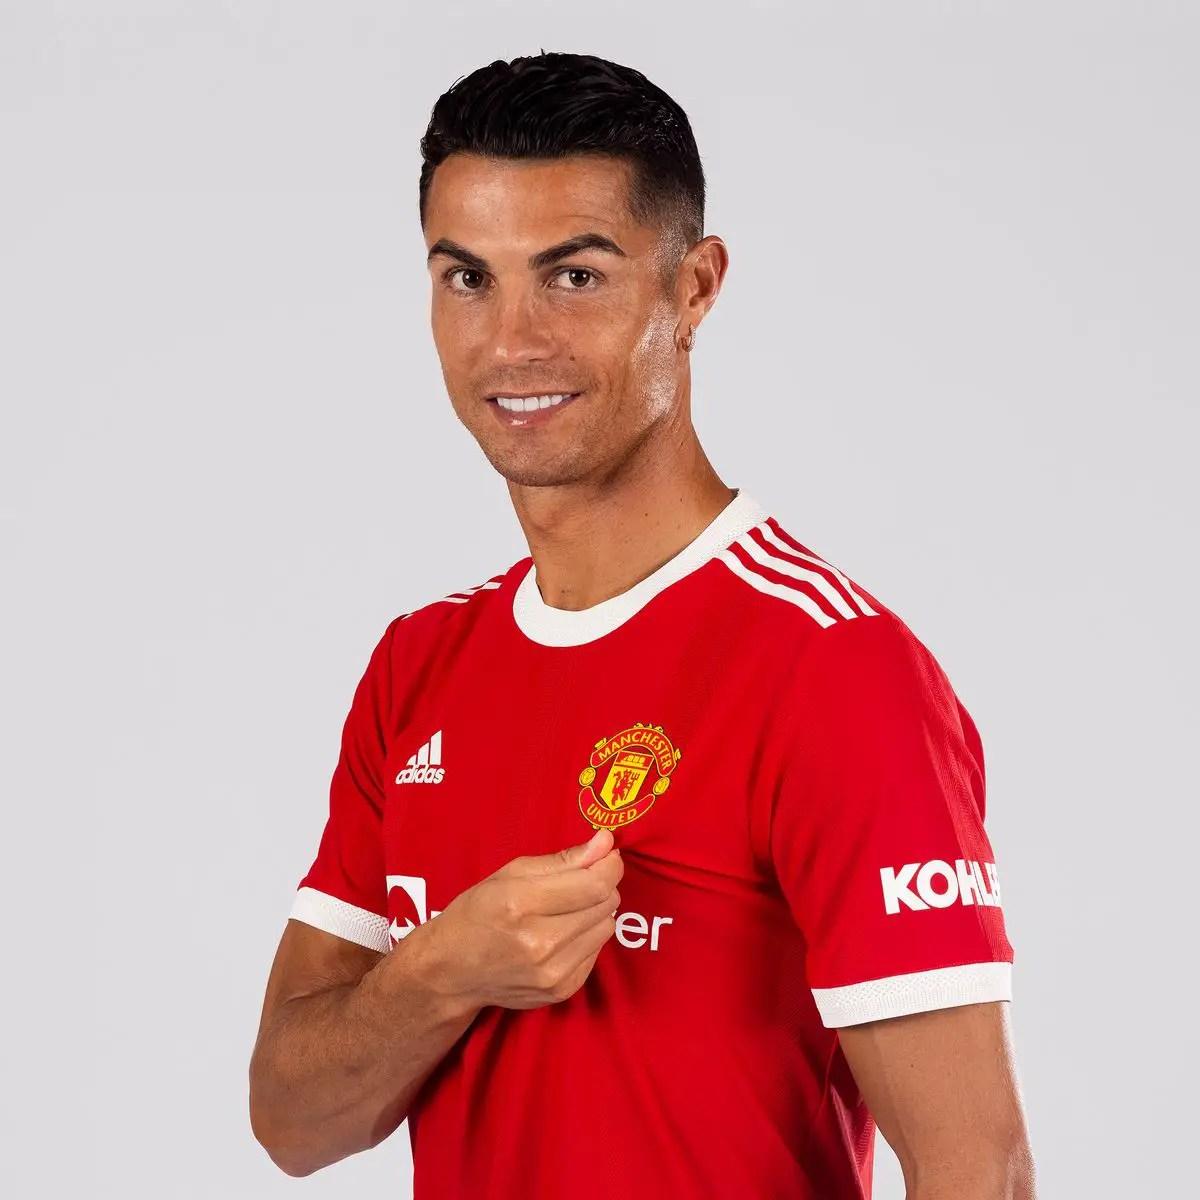 Ronaldo: I Want To Win Major Trophies Again At Man United